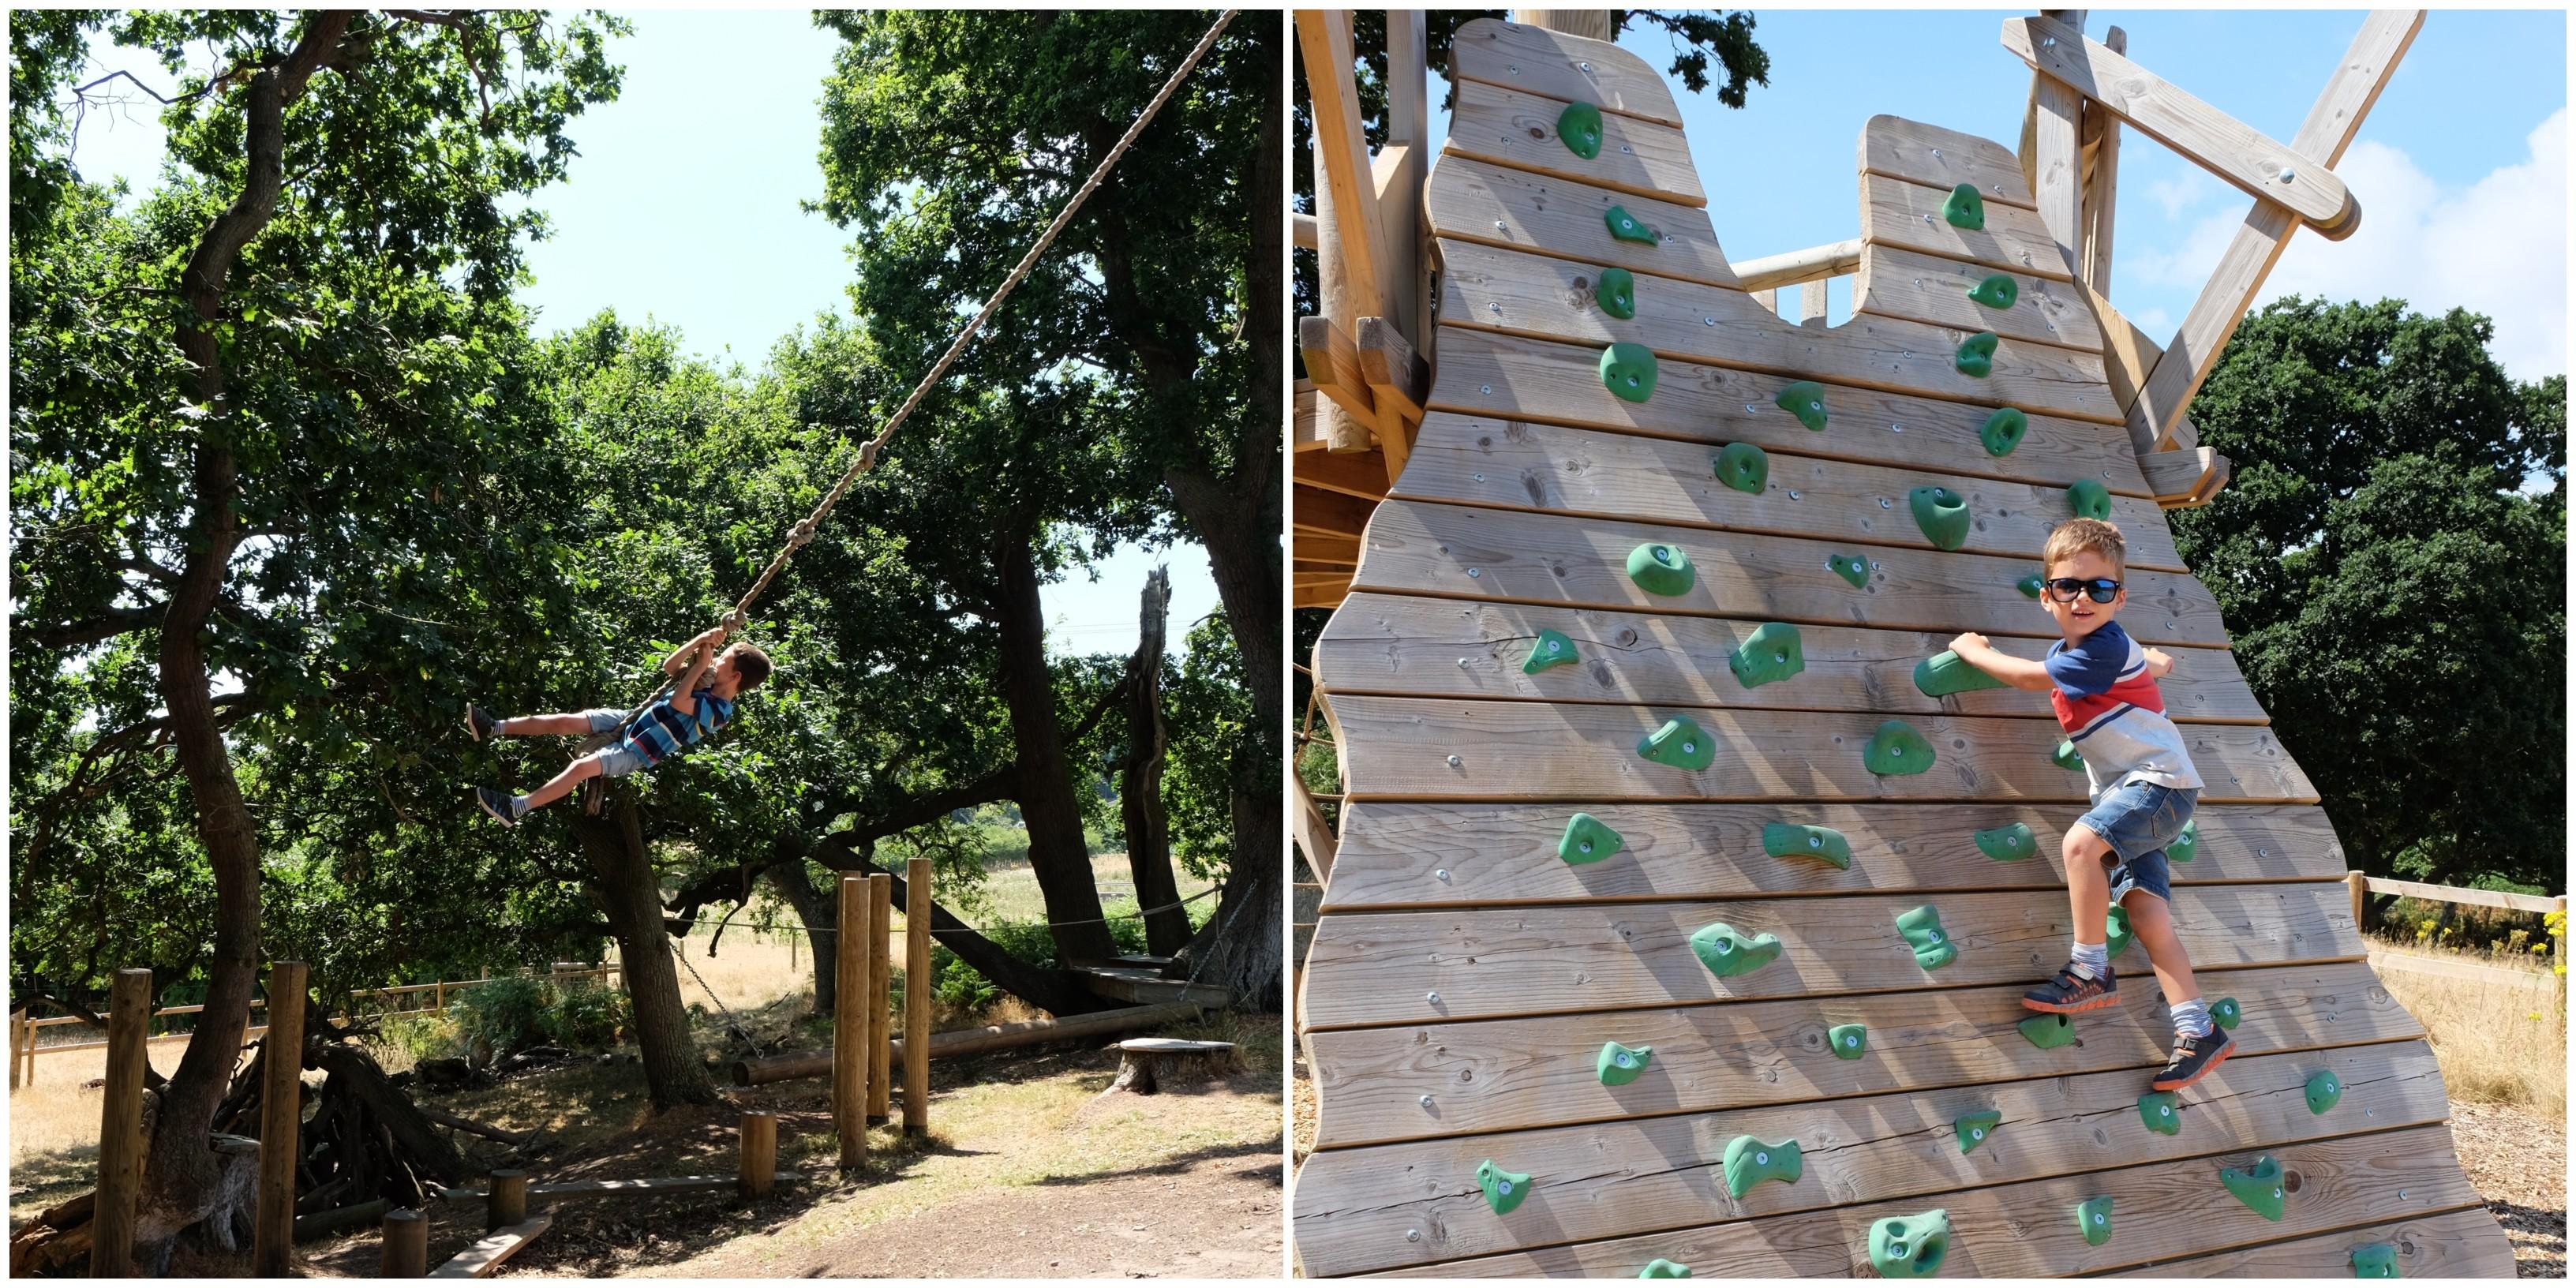 RSPB Arne Kids Play Park